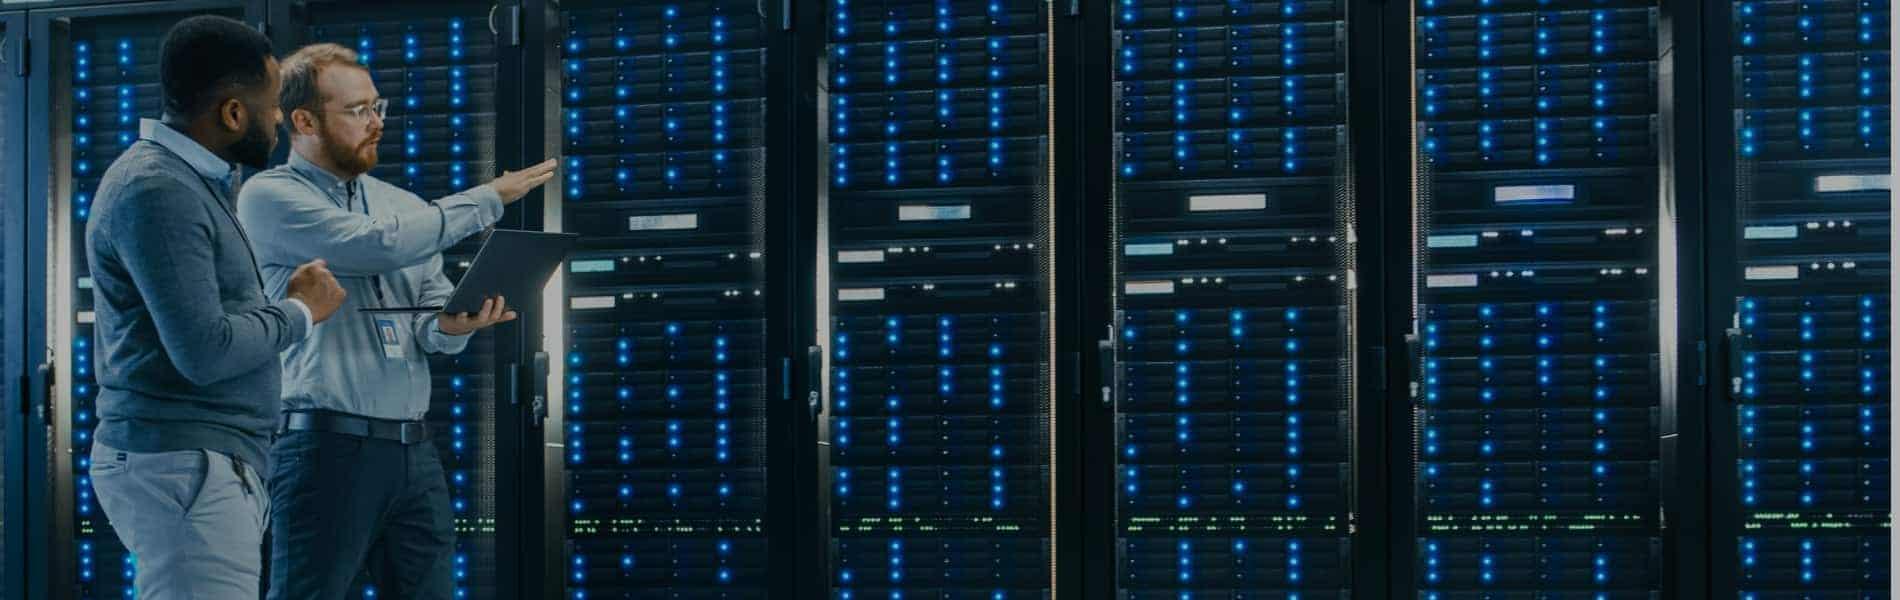 teck-genius-server-hosting